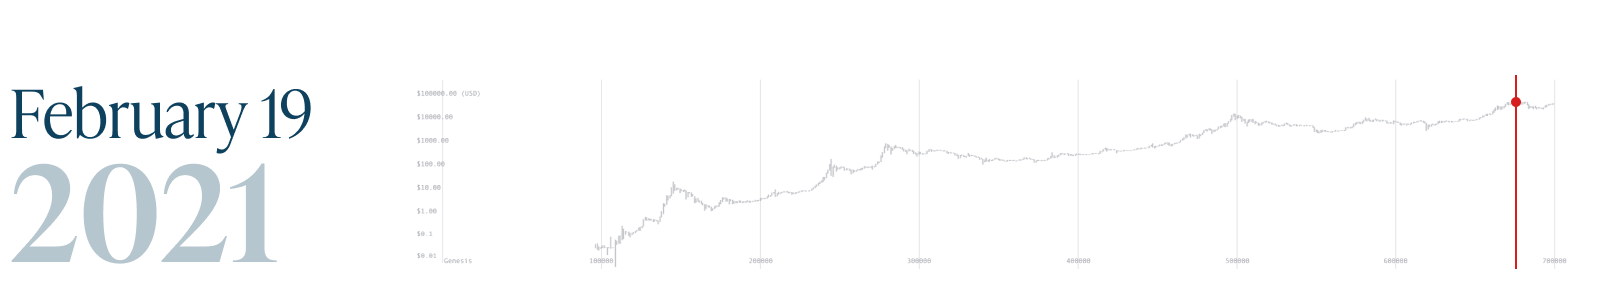 Monochrome_Bitcoin Block 700k_19 Feb 2021.png